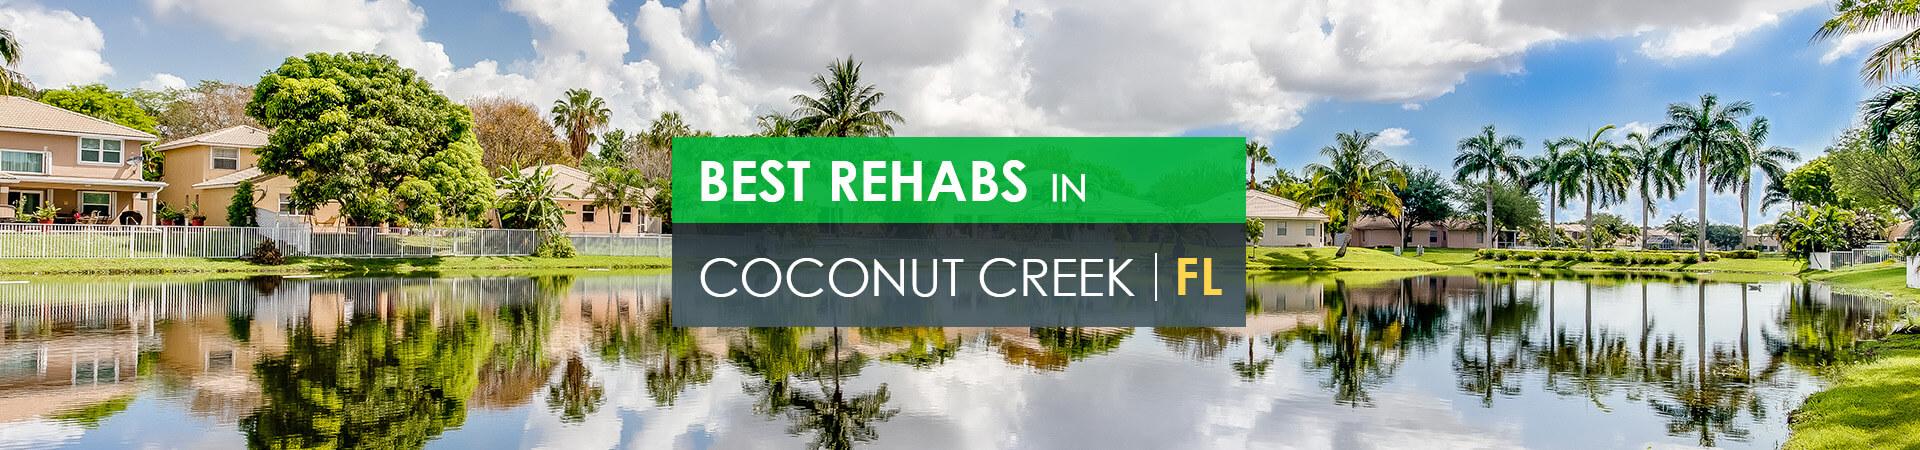 Best rehabs in Coconut Creek, FL